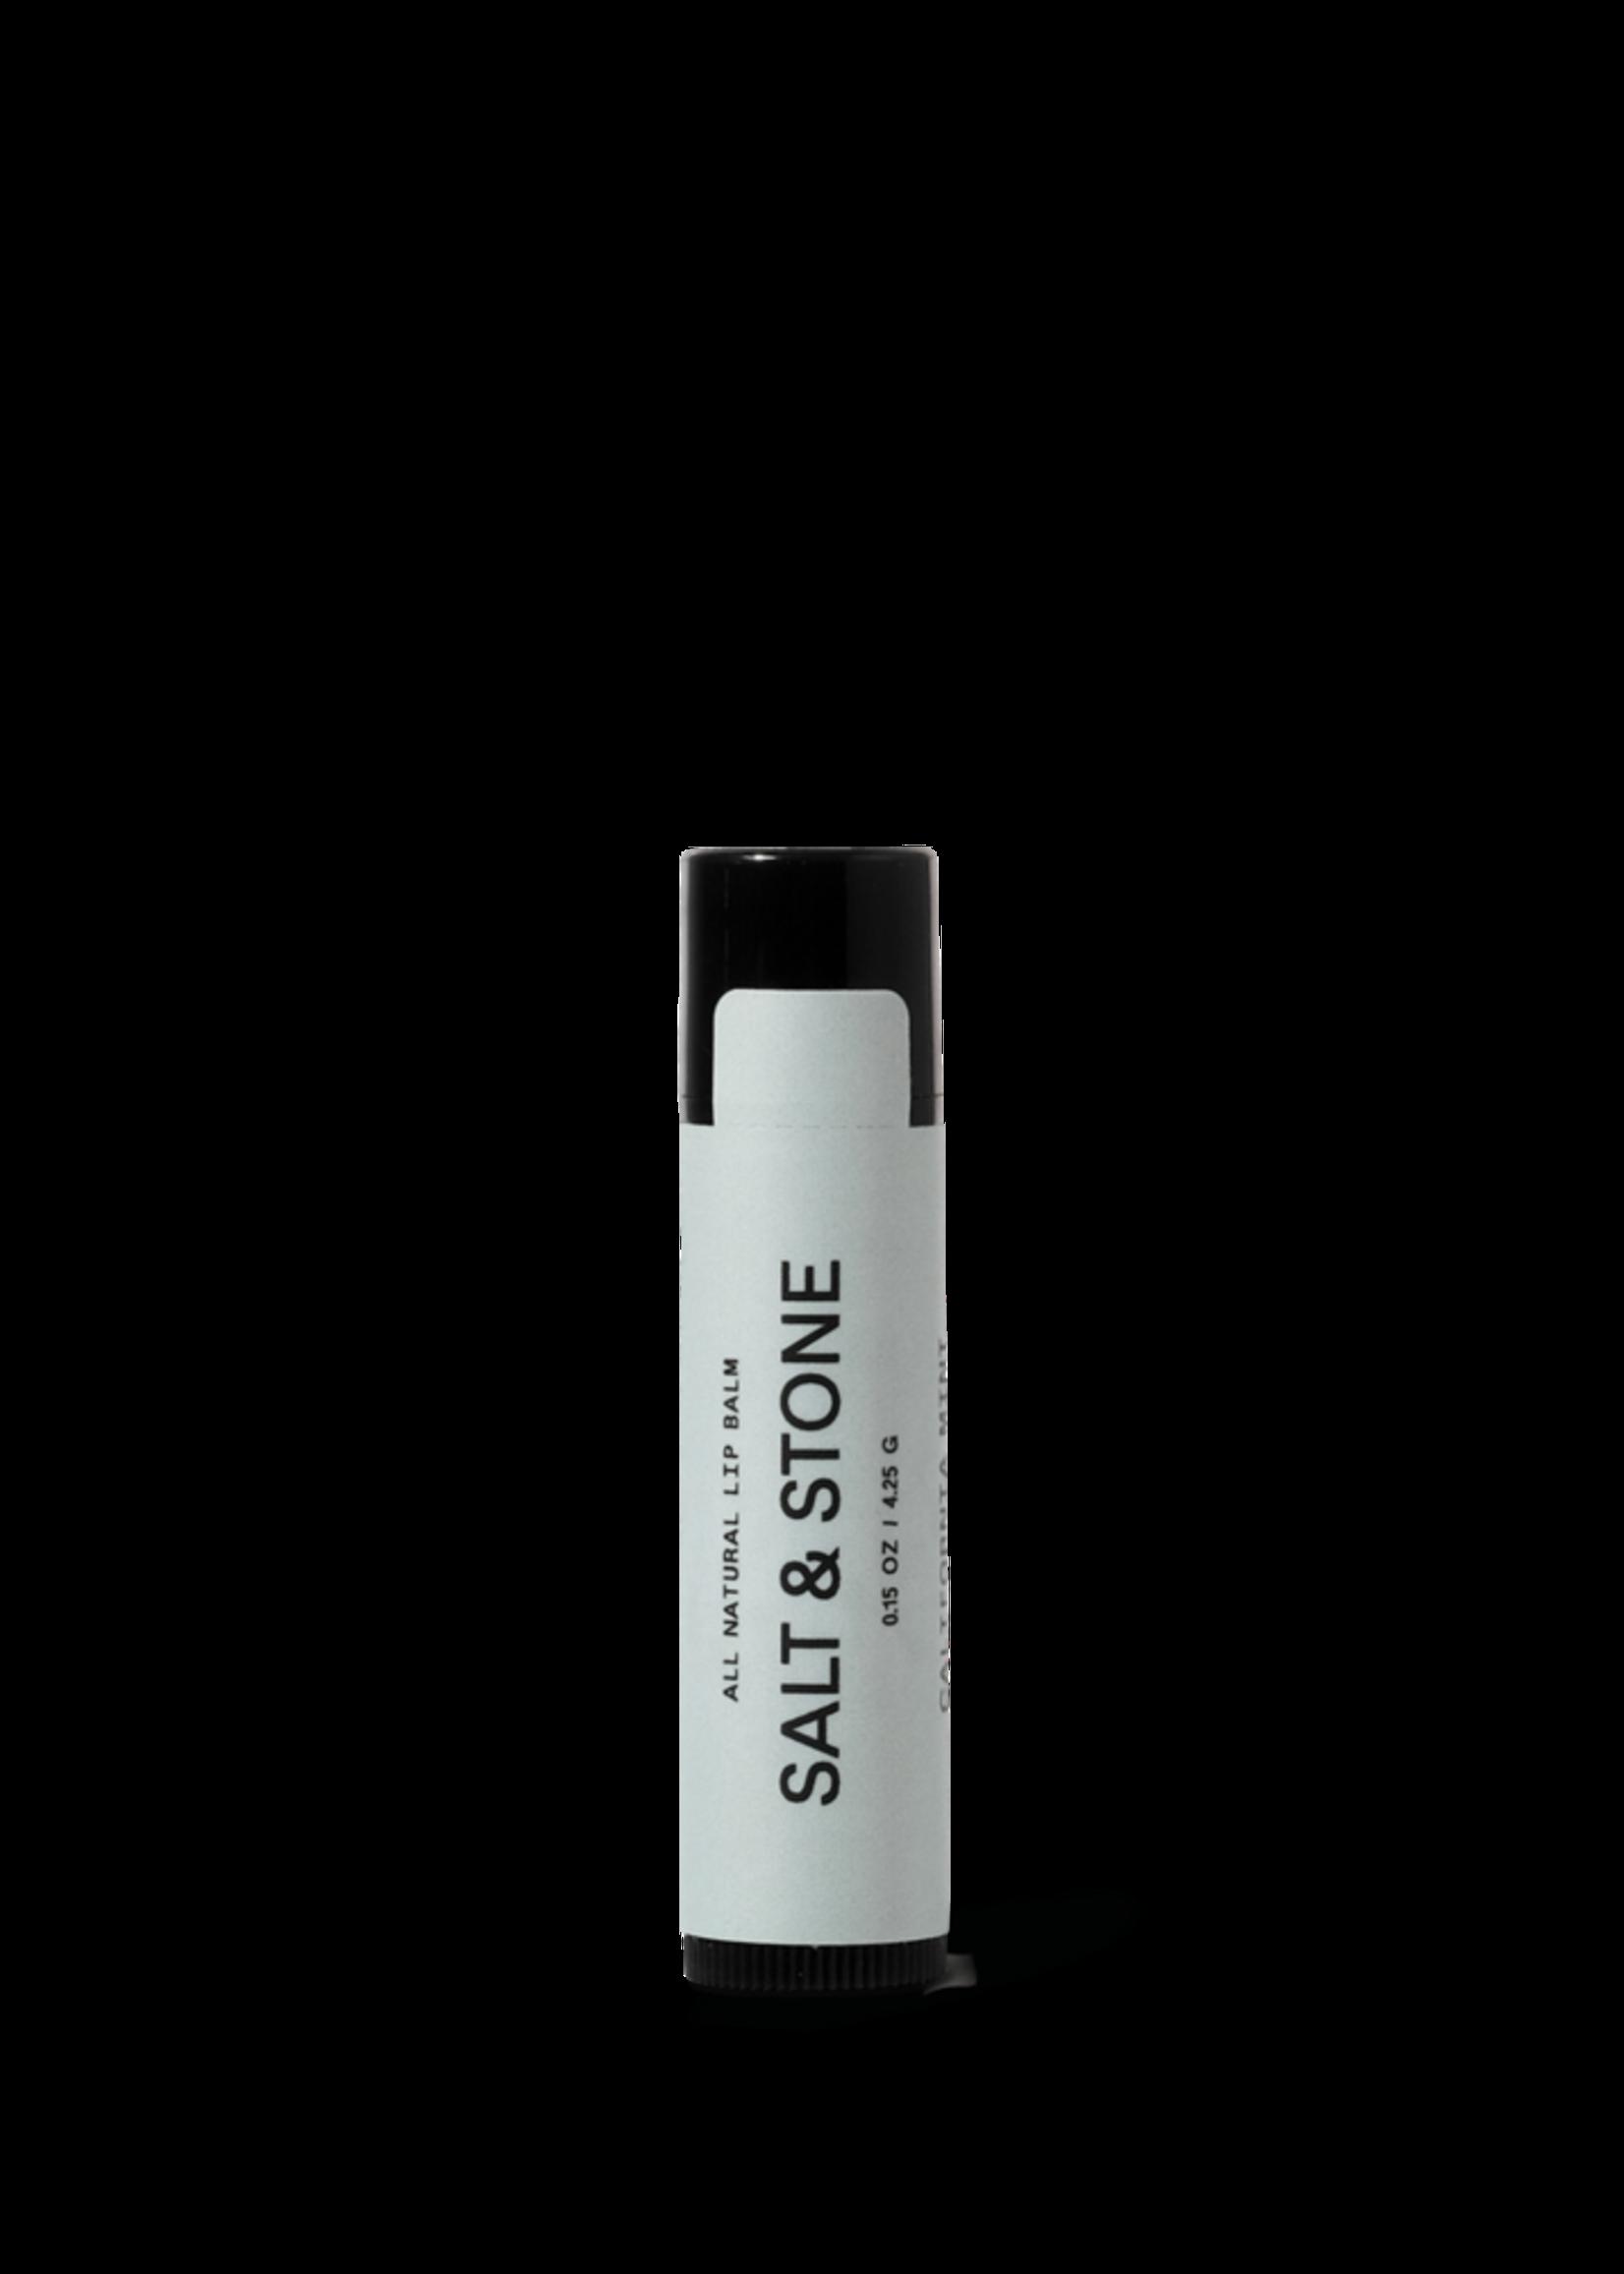 SALT & STONE California Mint Lip Balm